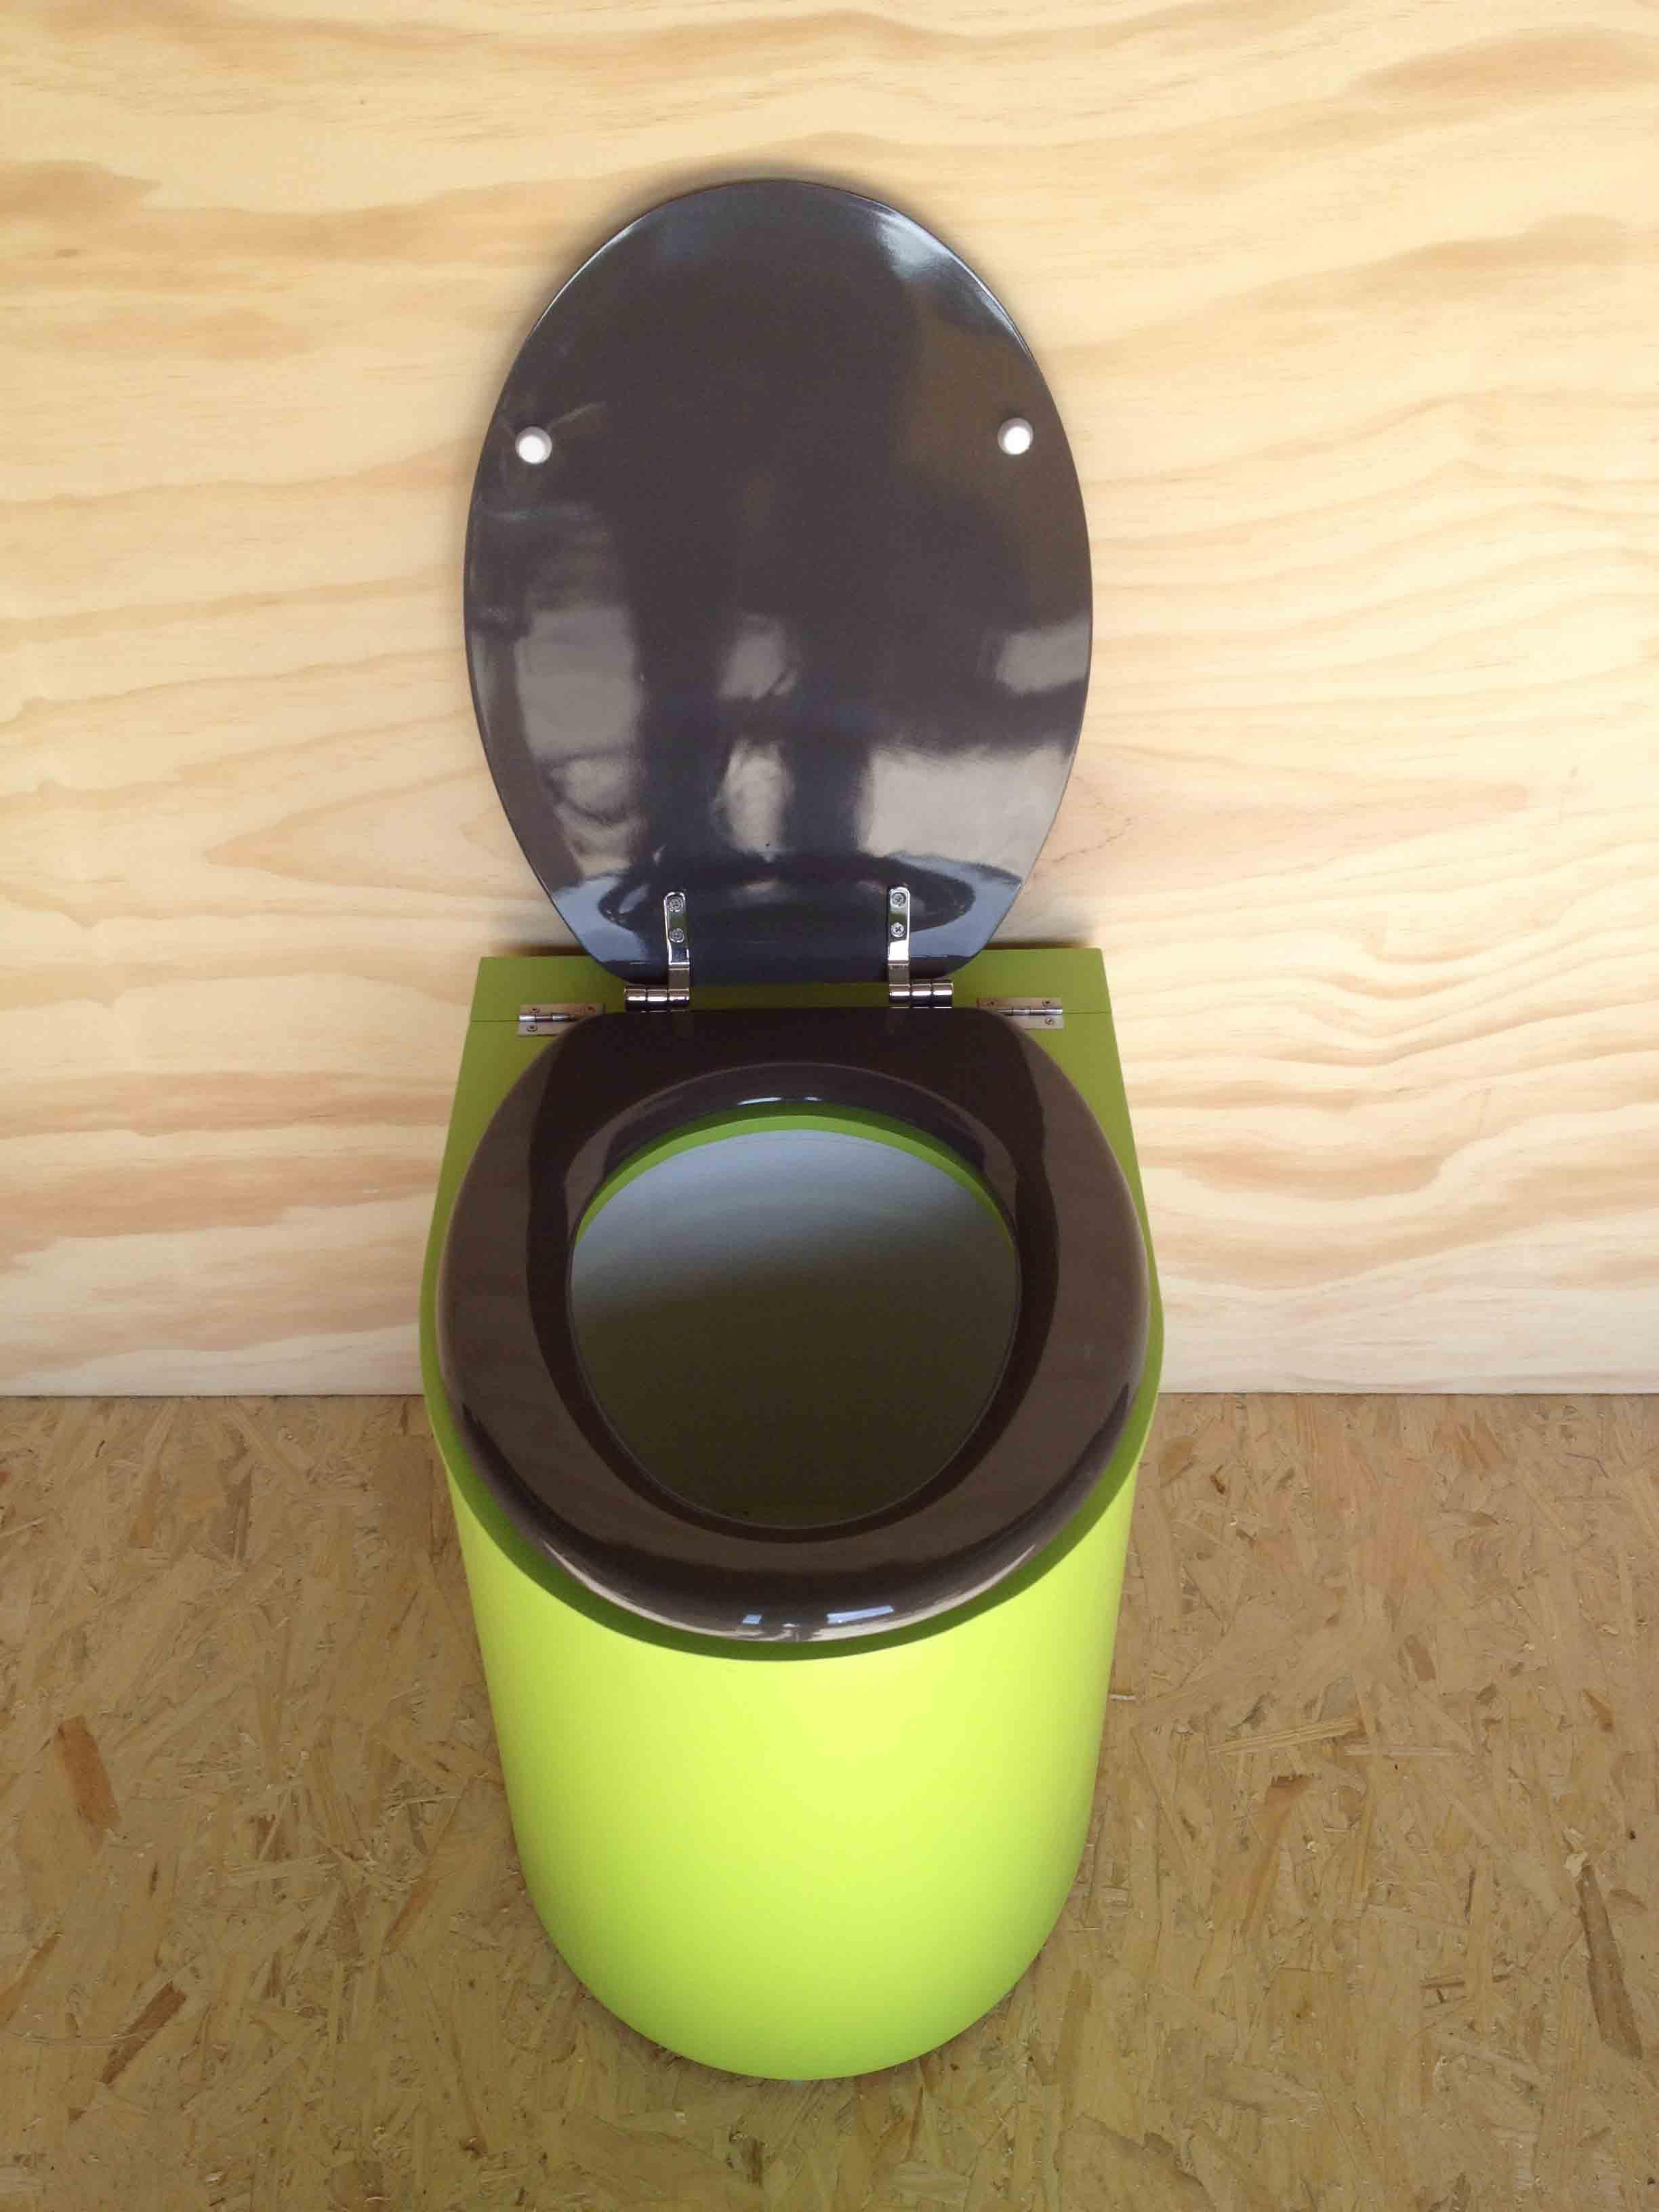 toilettes-seches-modernes-vertes